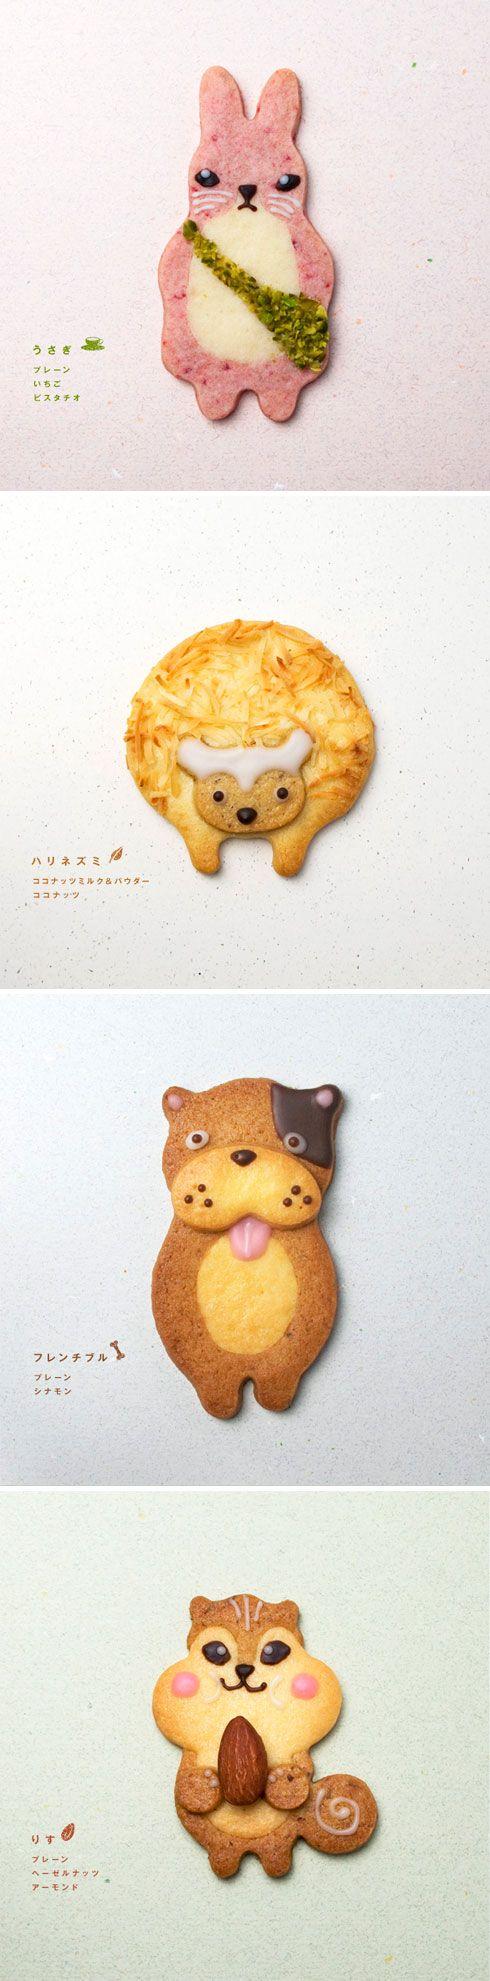 Adorable animal cookies.